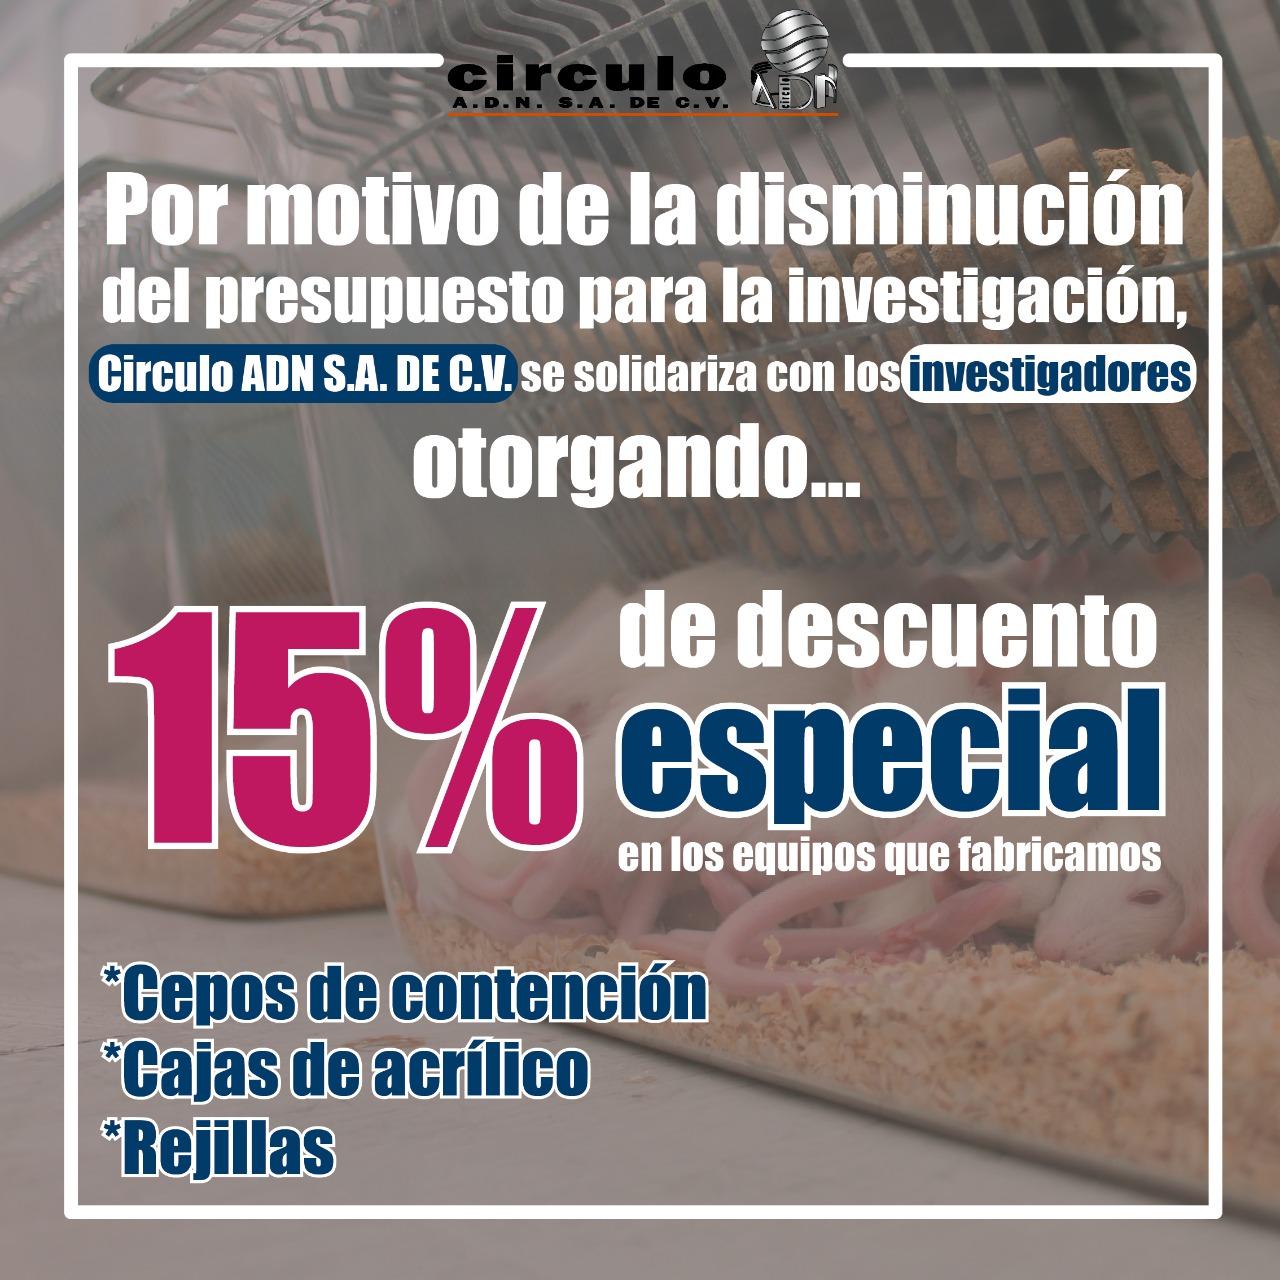 Promocion | CirculoADN